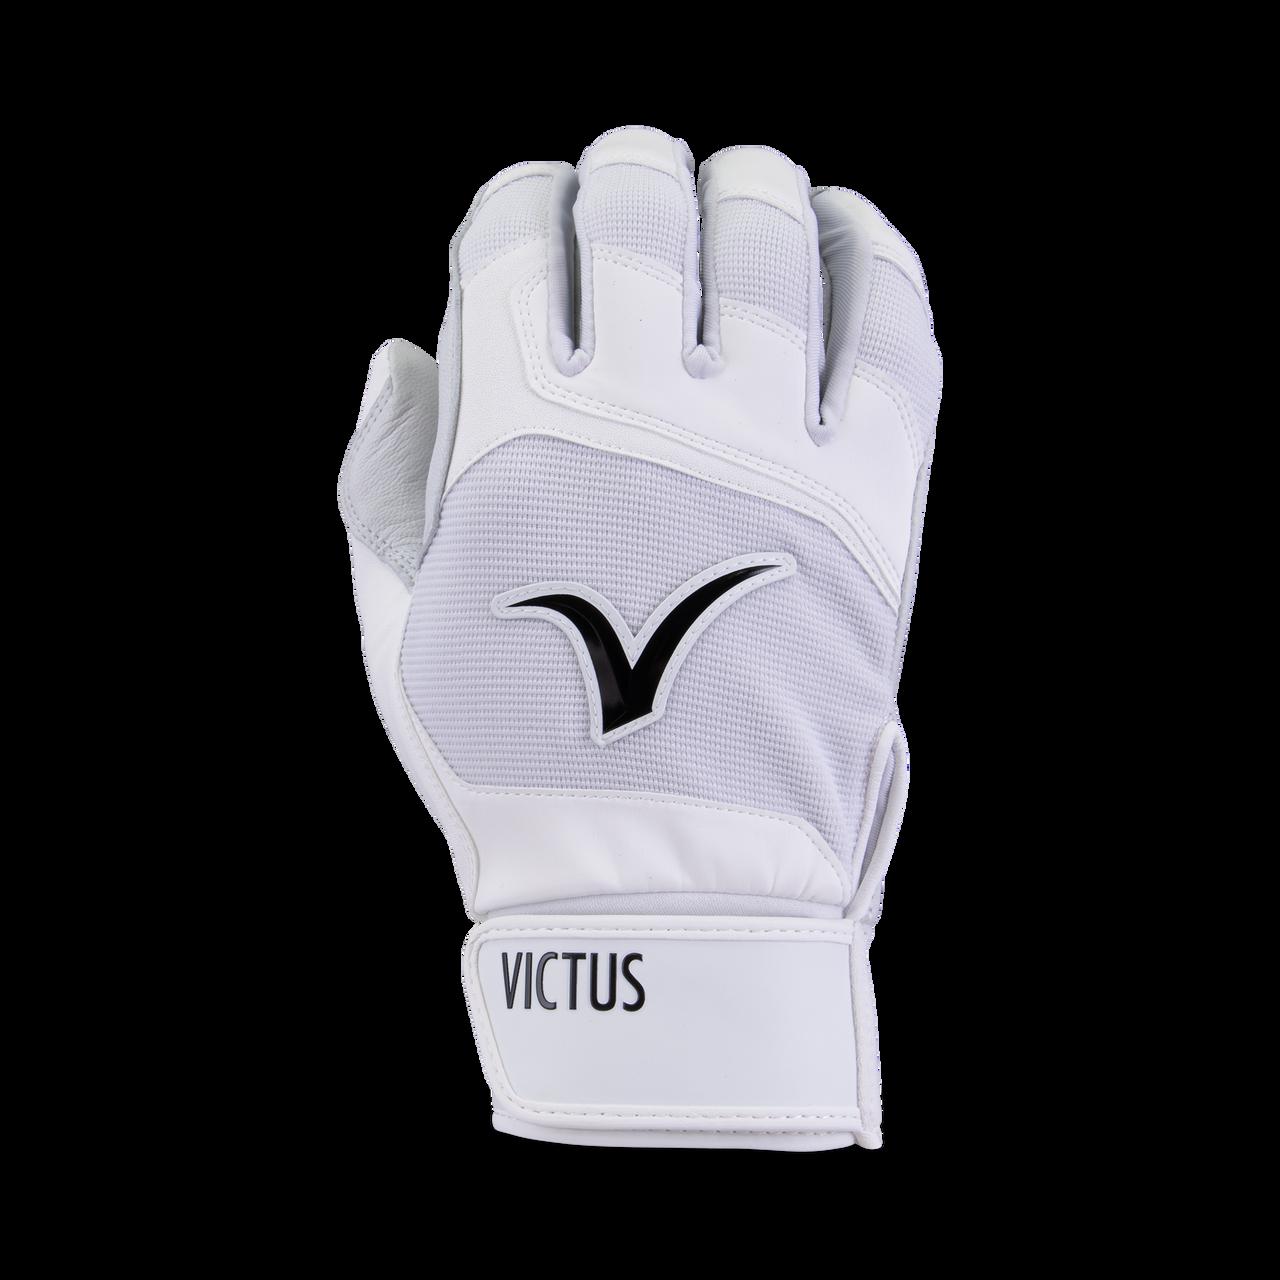 Debut 2.0 Youth Batting Gloves